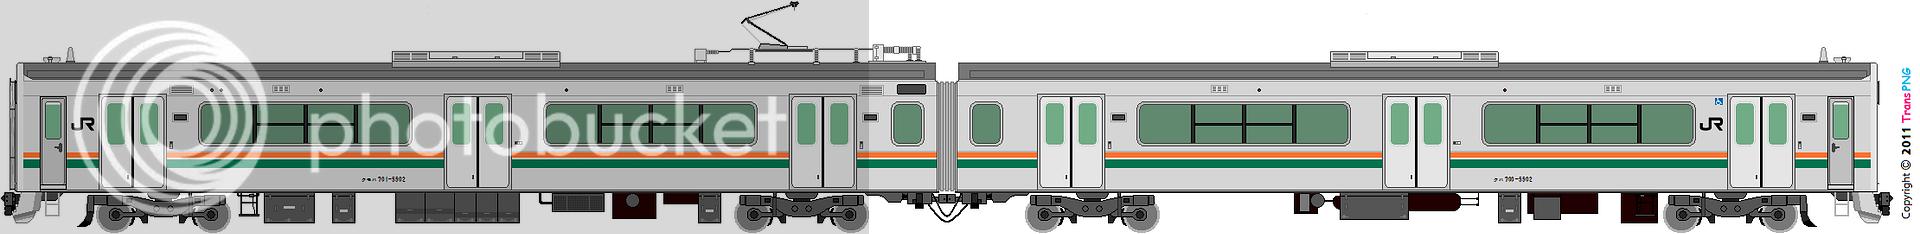 Train 2259